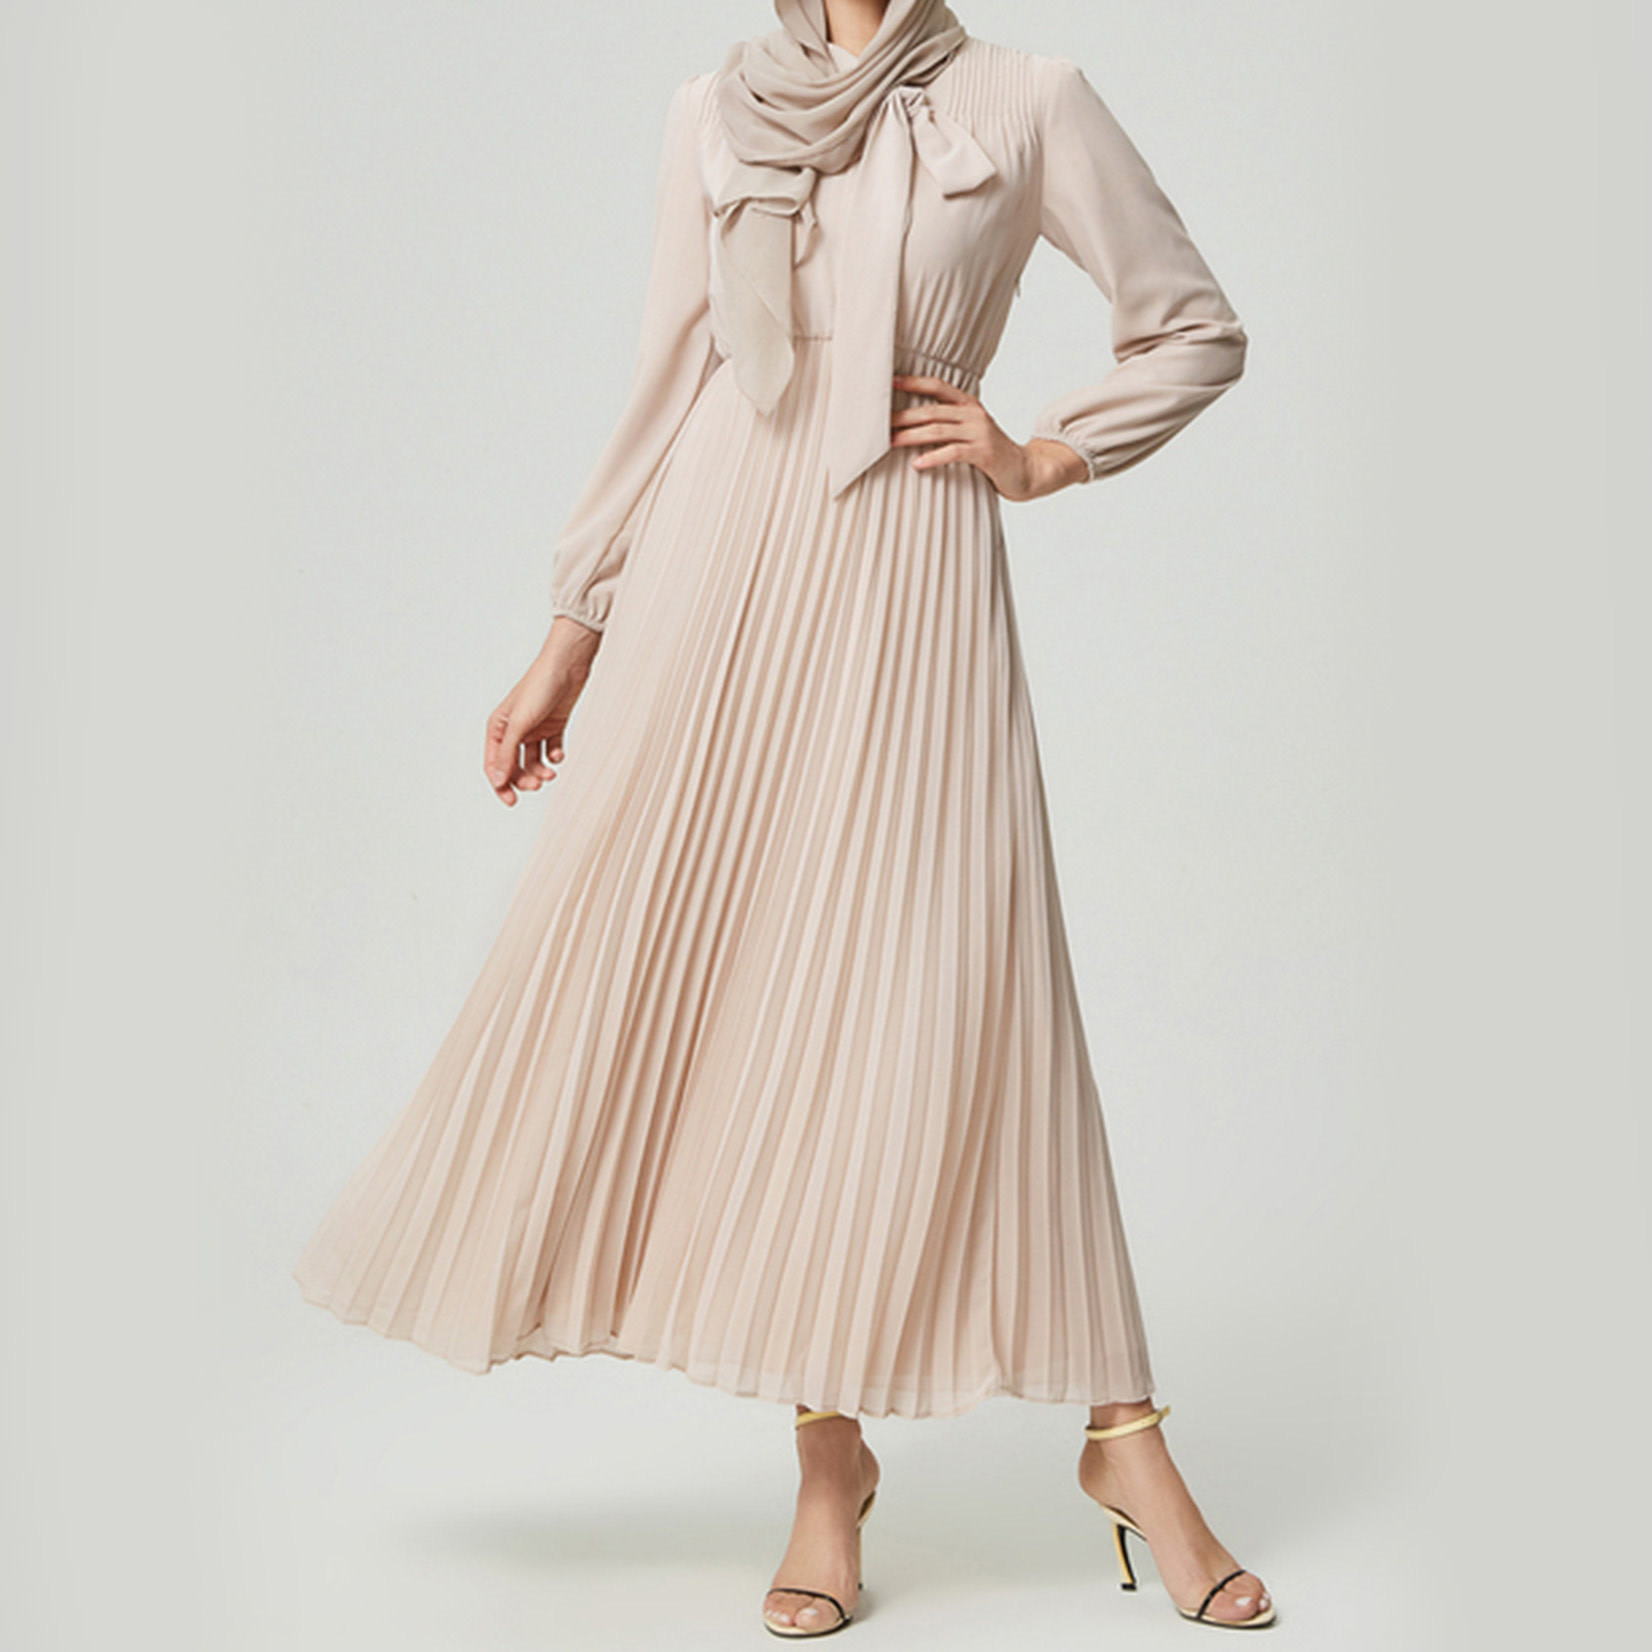 Hijab House Oyster Pleated Dress